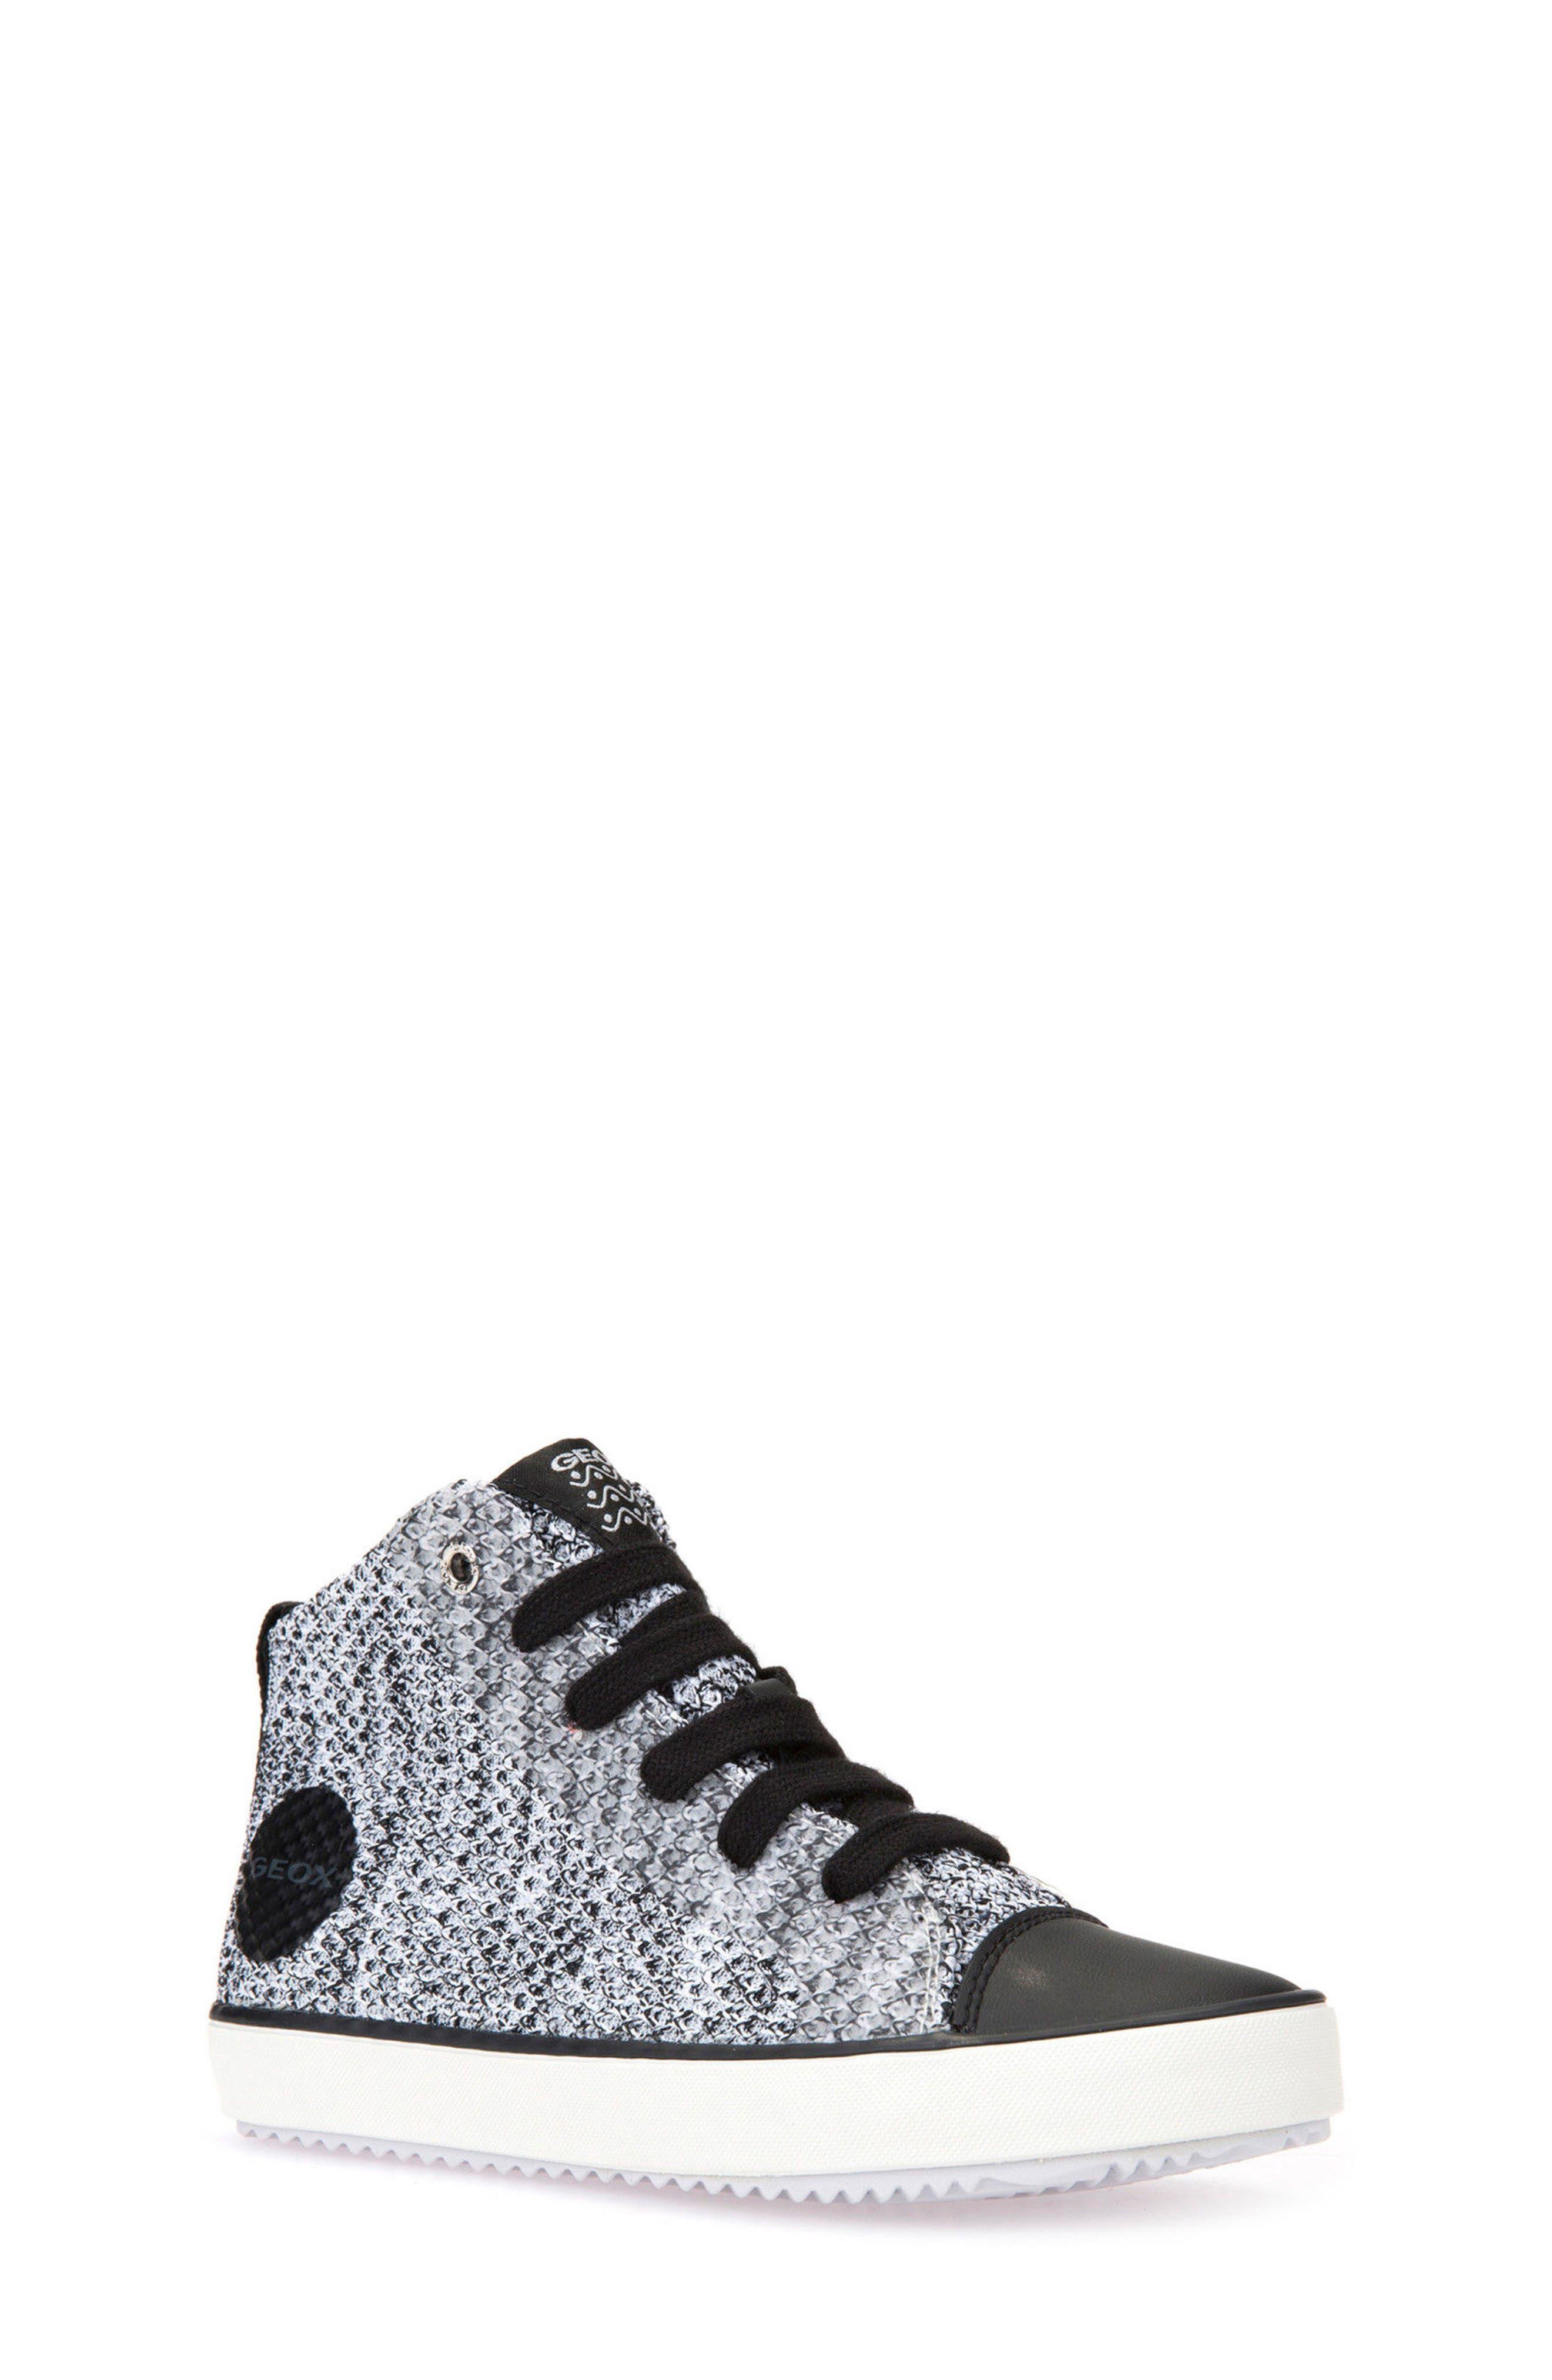 Alonisso Knit Mid Top Sneaker,                             Main thumbnail 1, color,                             WHITE/ BLACK